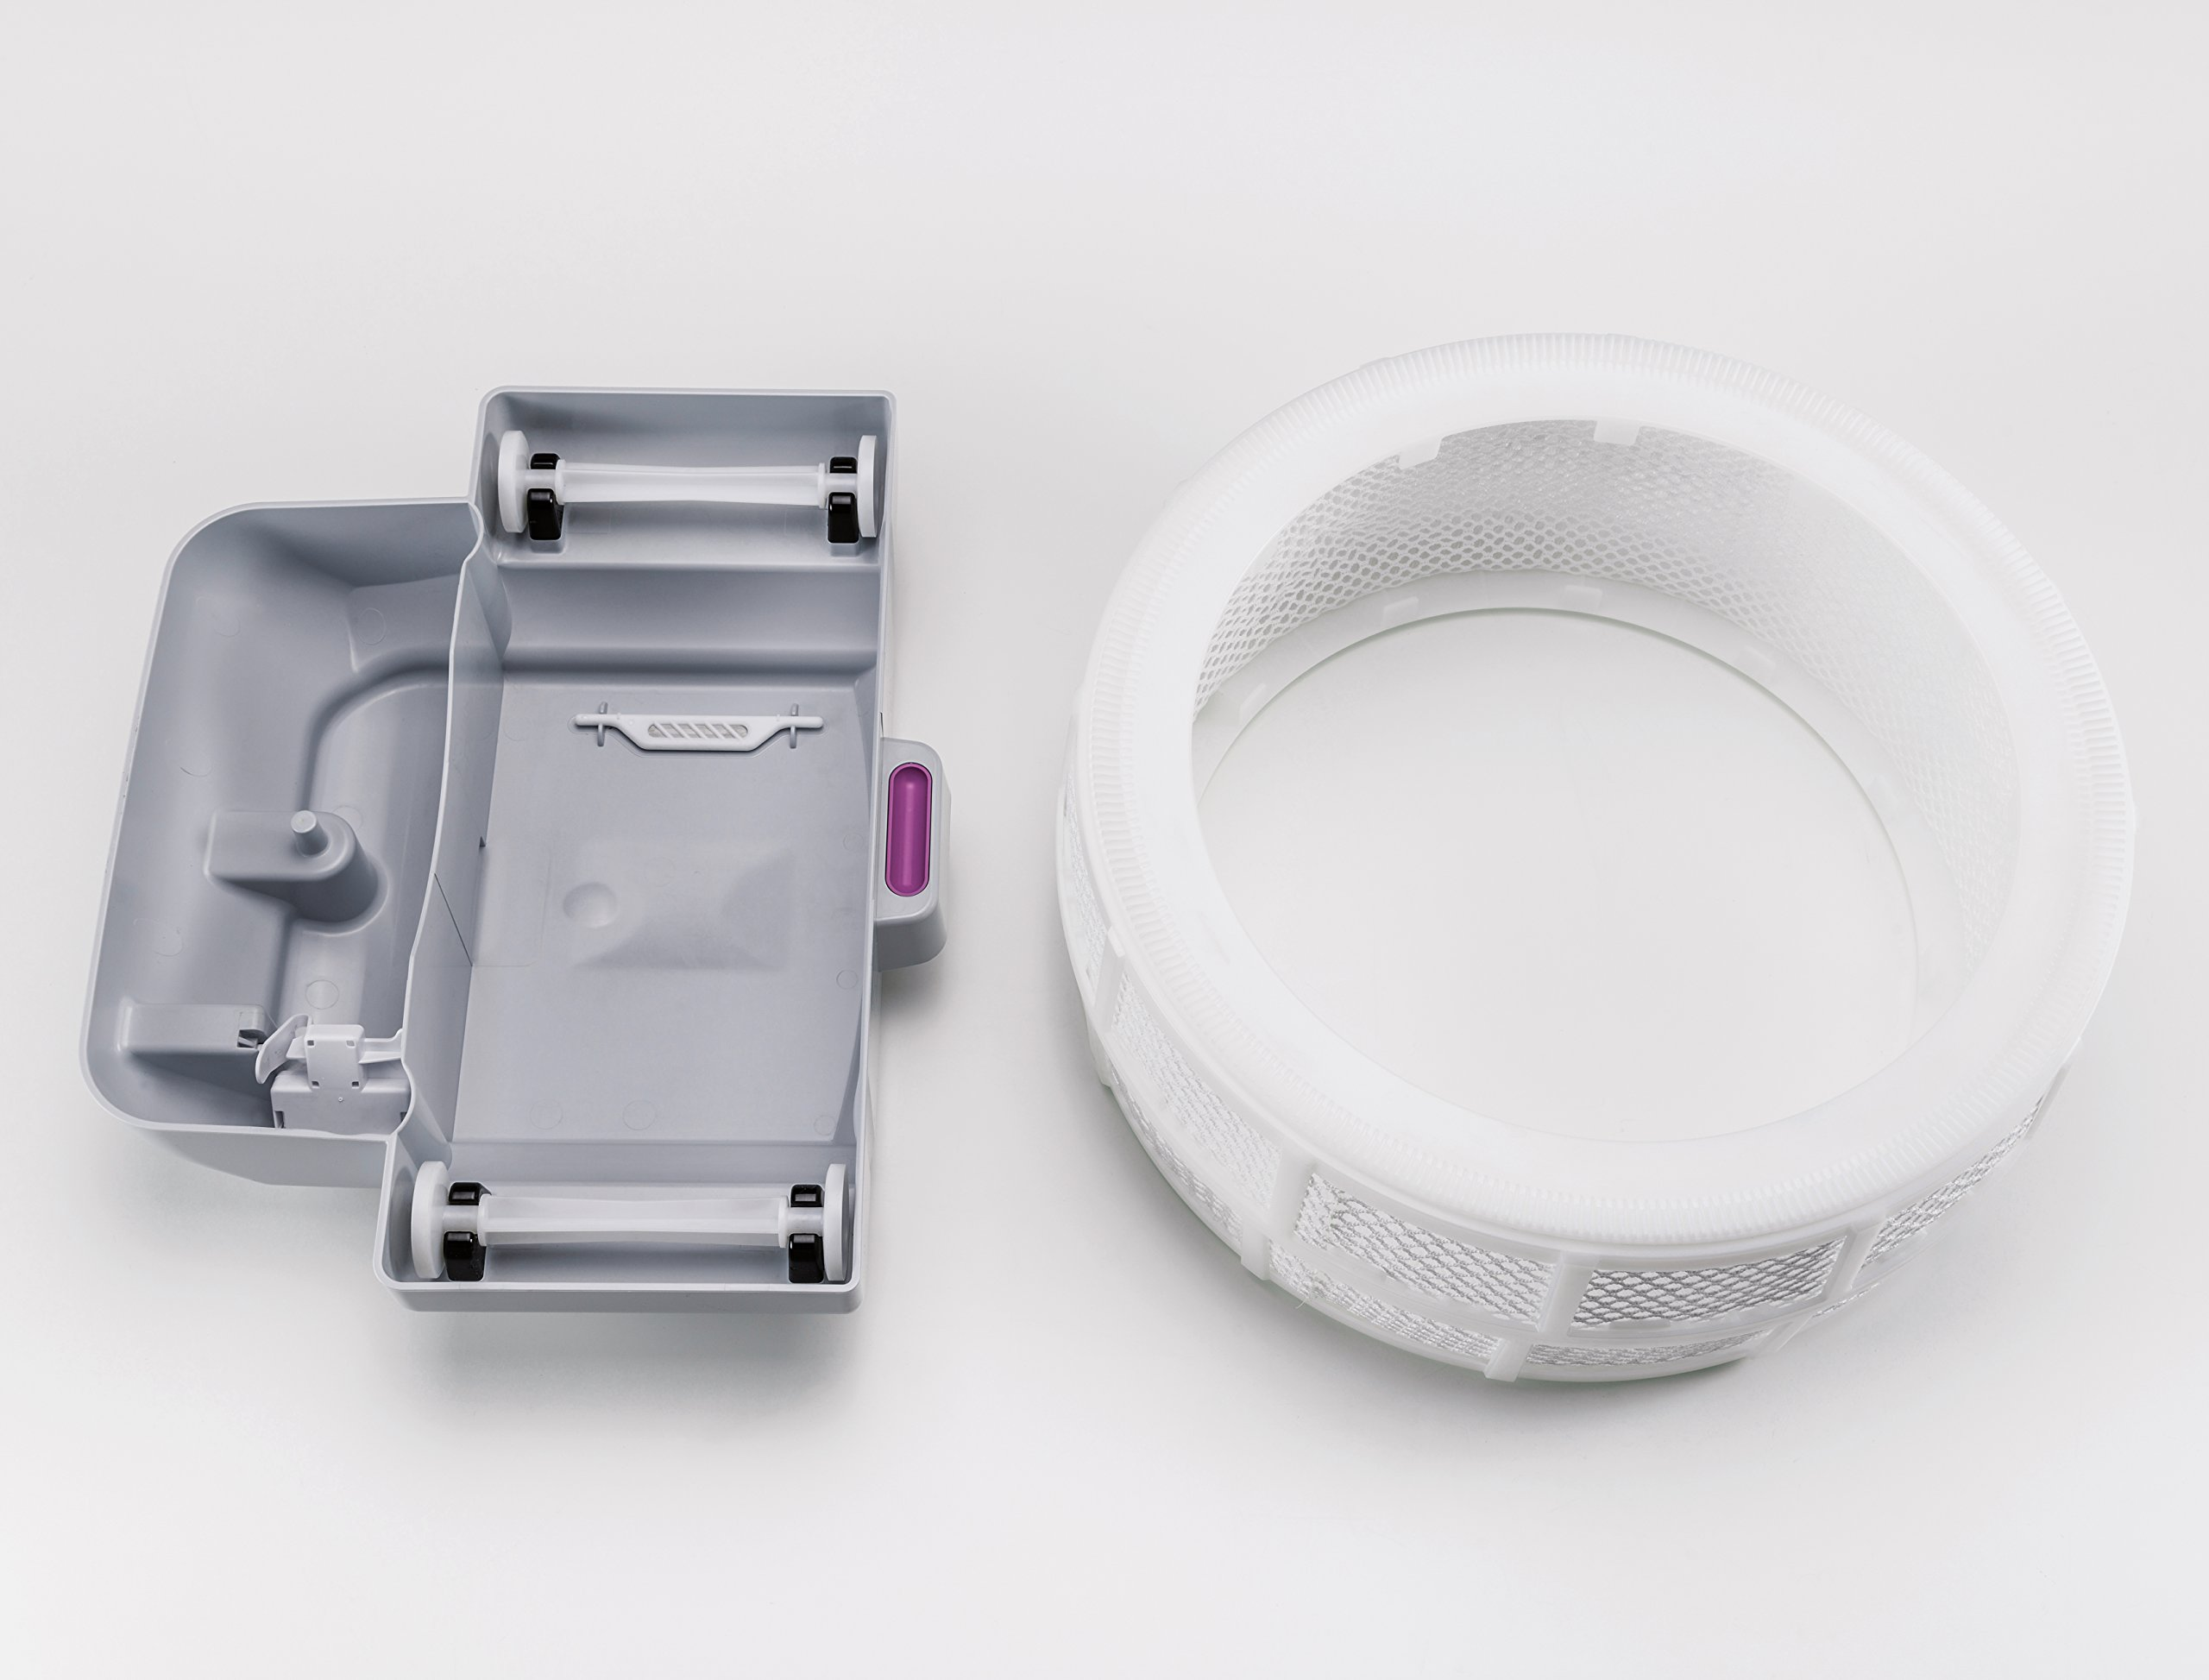 81e jHTlOtL - Boneco H680 Hybrid Air Purifier and Humidifier, 10 Litre, 30 W, White